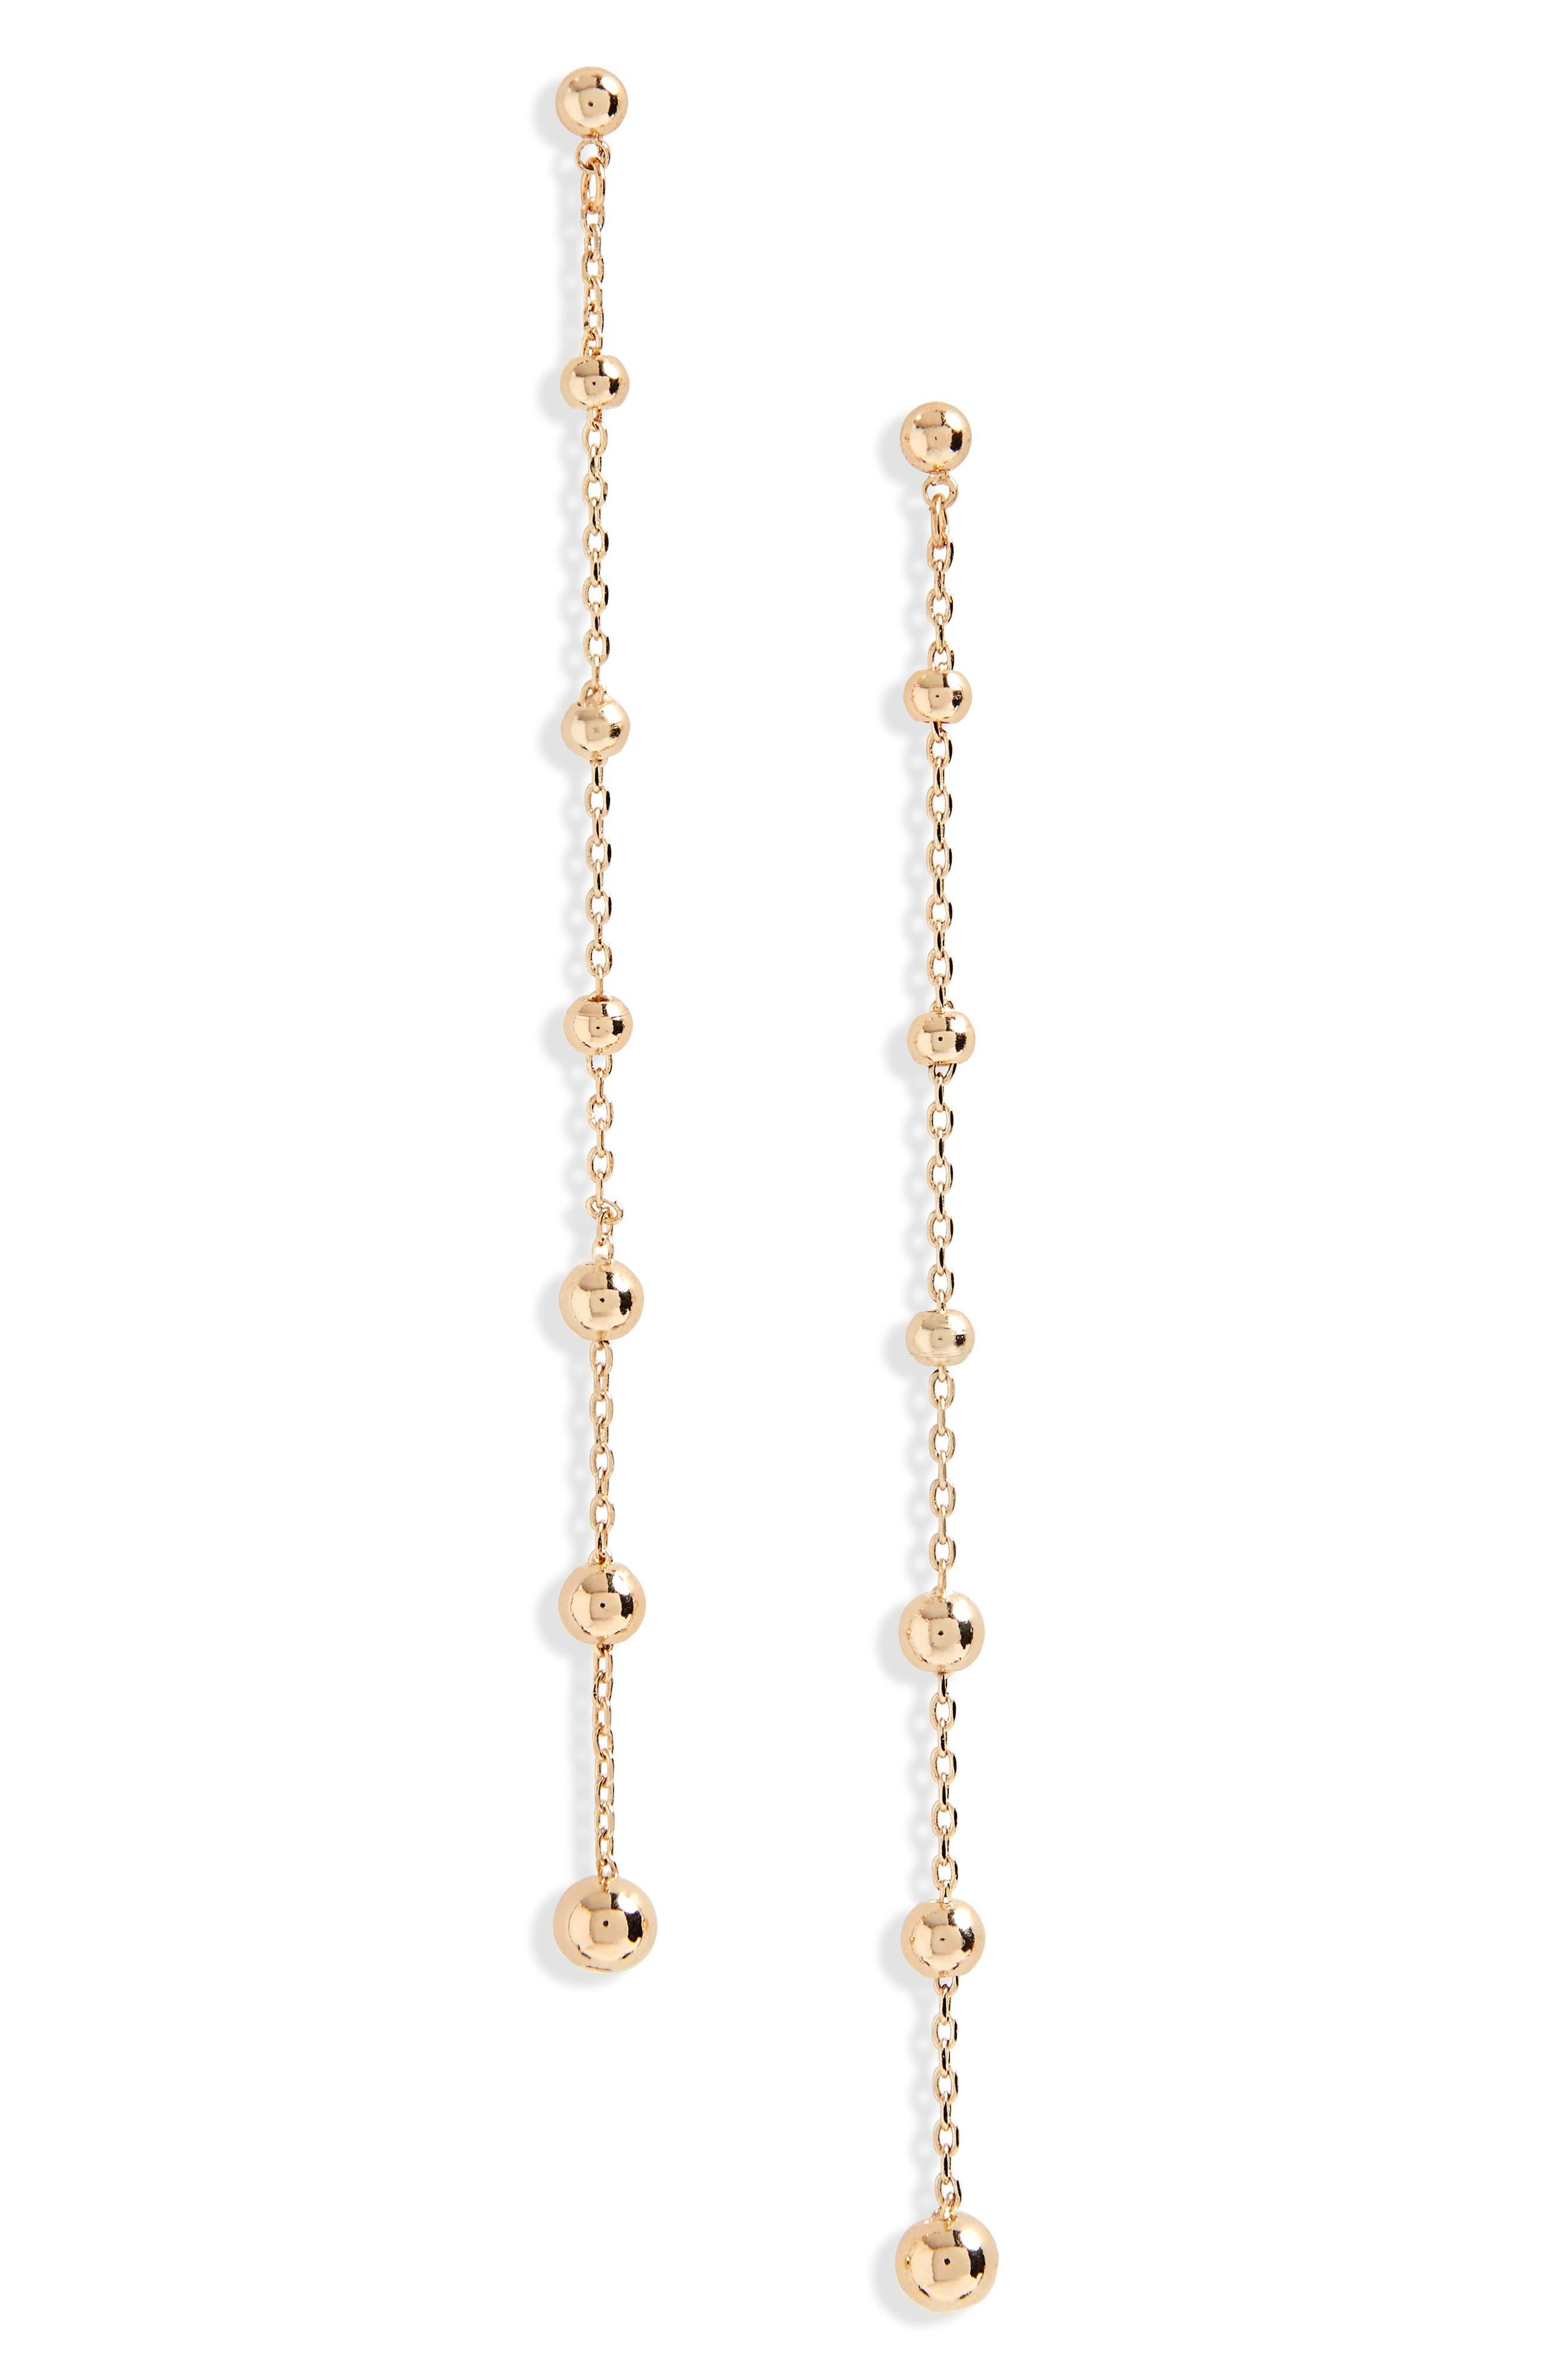 Chain & Ball Drop Earrings,                         Main,                         color, Gold